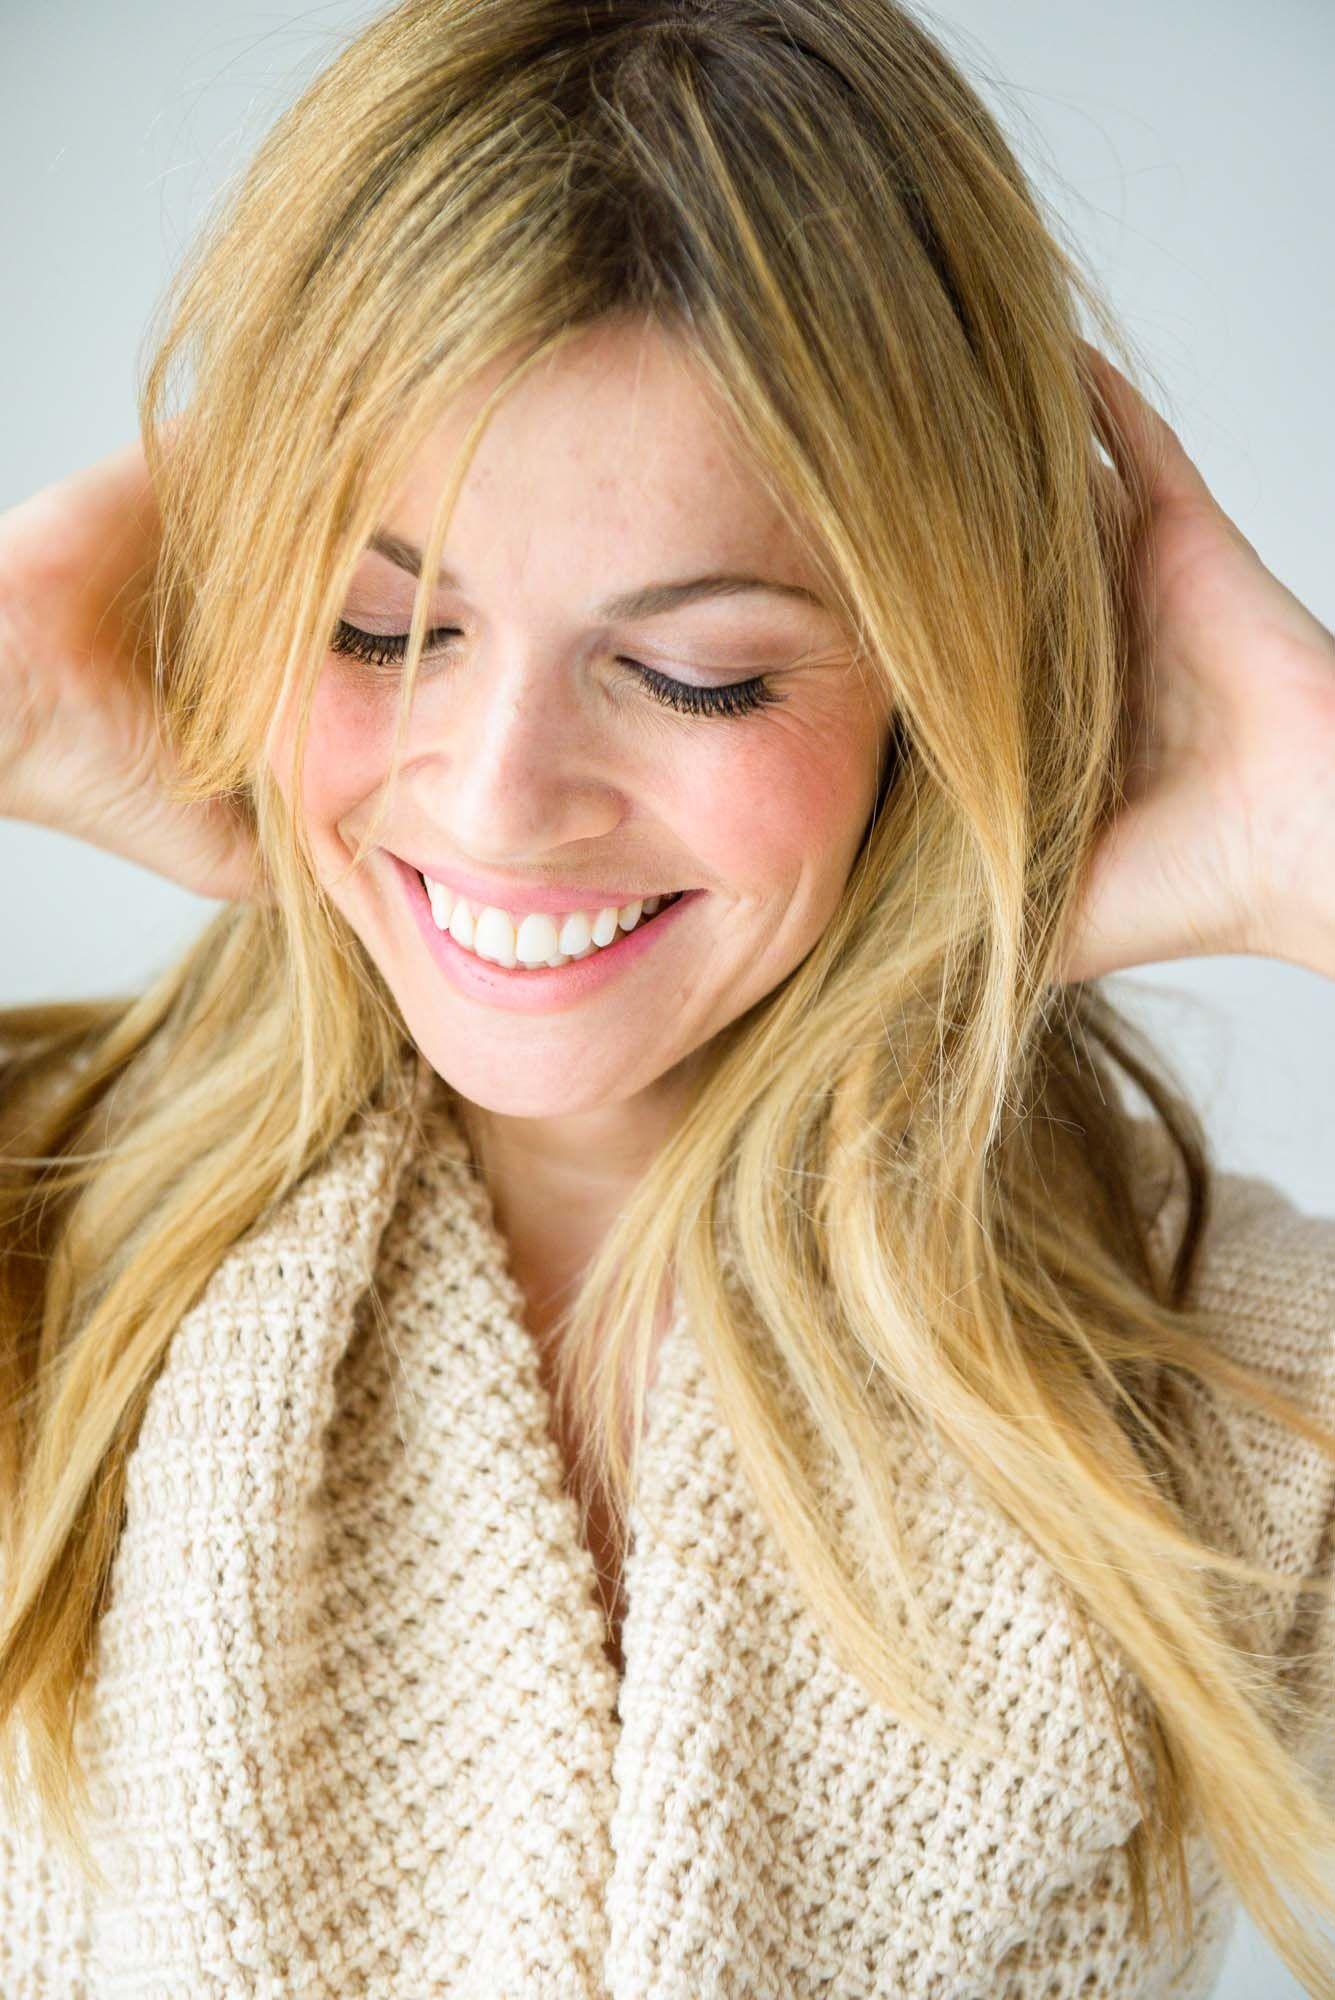 Makeup Tips Tips for Face, Eye, Nails & Lip Makeup